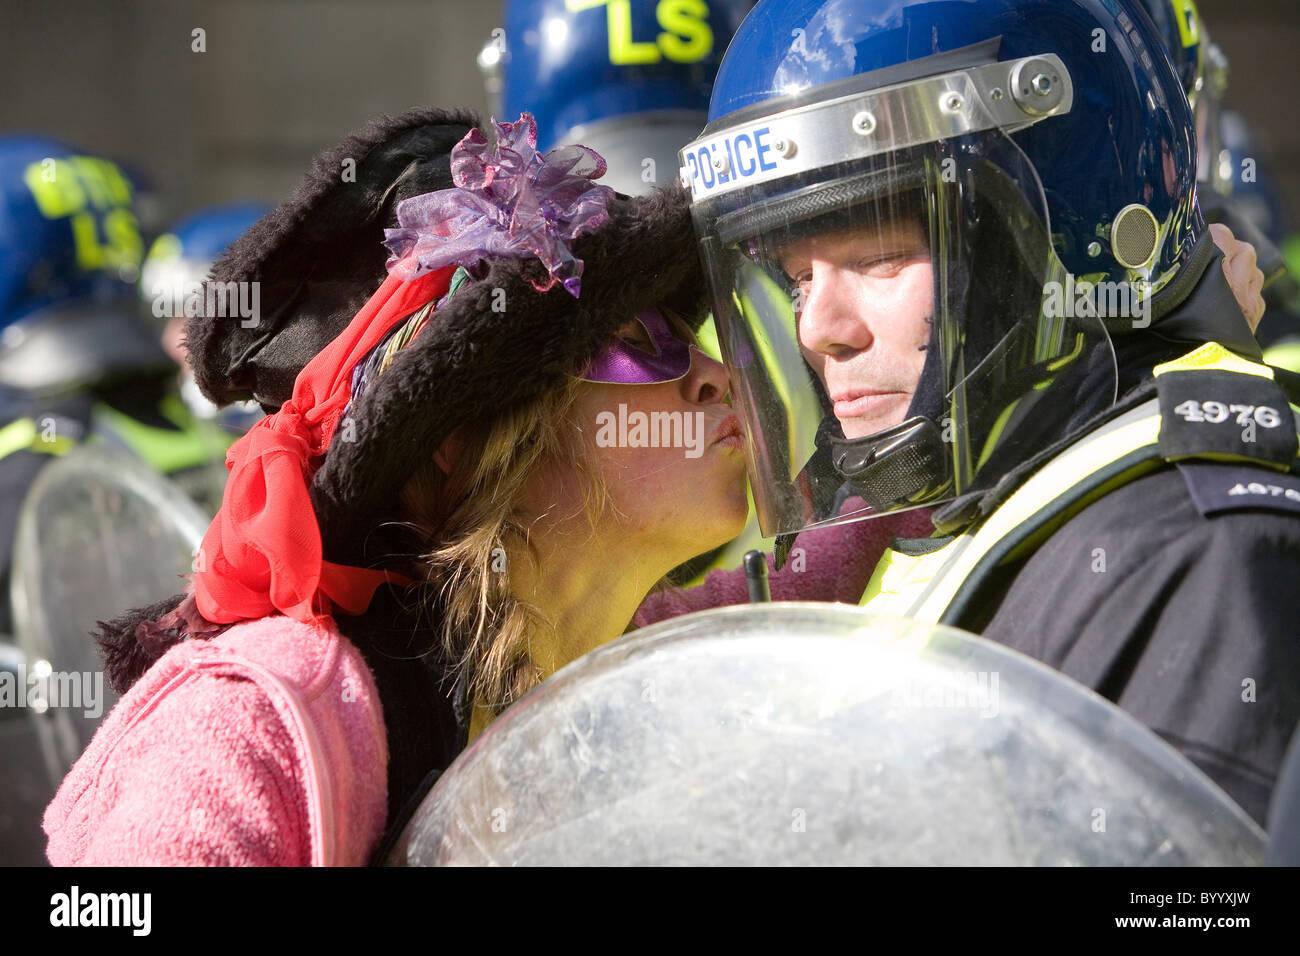 A G20 protester kisses a riot policeman at Bank 5pm 2/4/09 - Stock Image